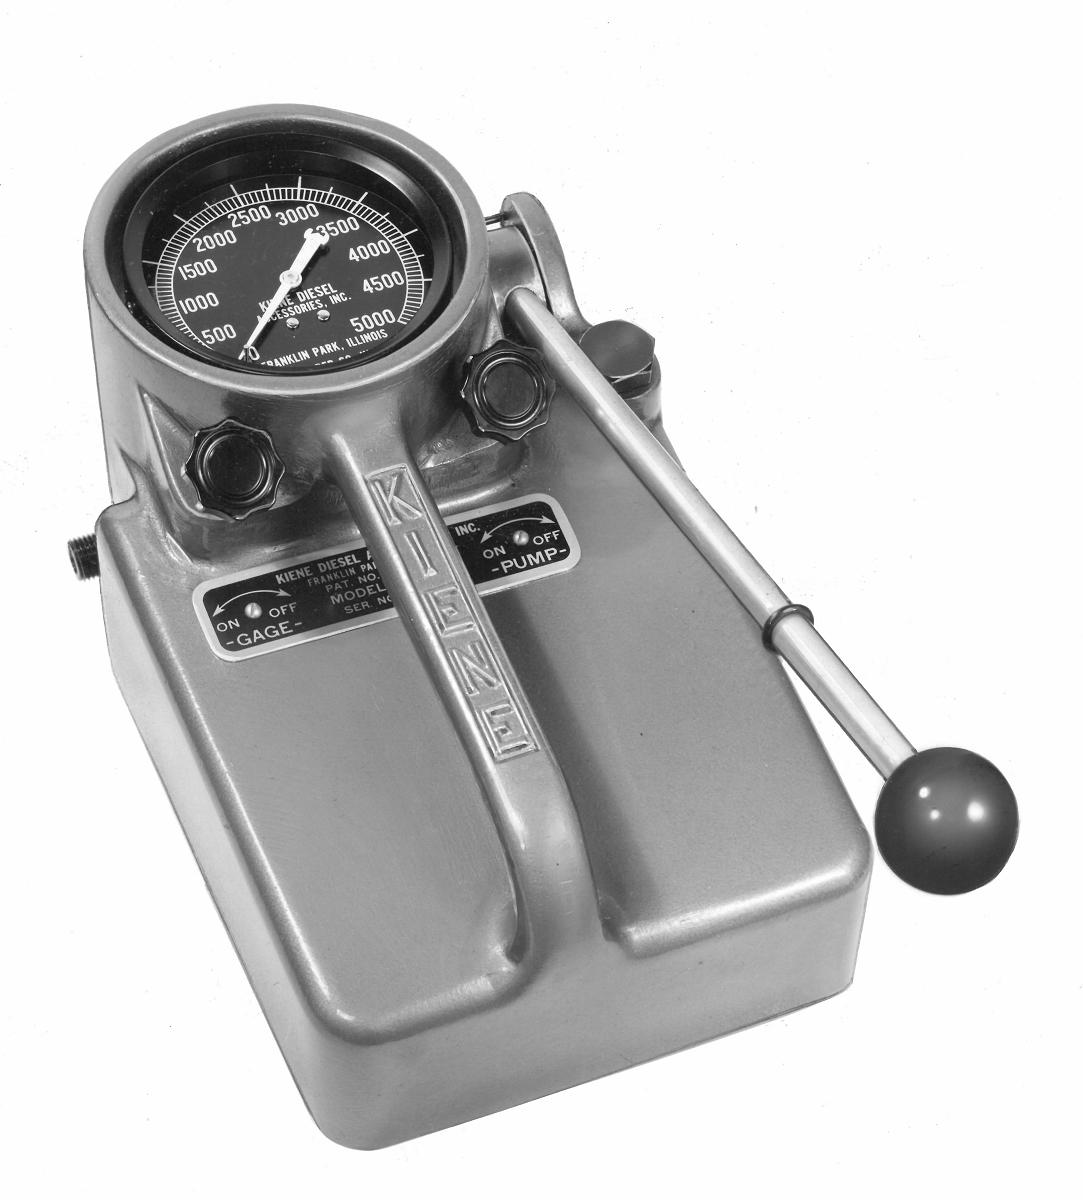 Fuel Injection Nozzle Tester DT-1300 | Kiene Diesel